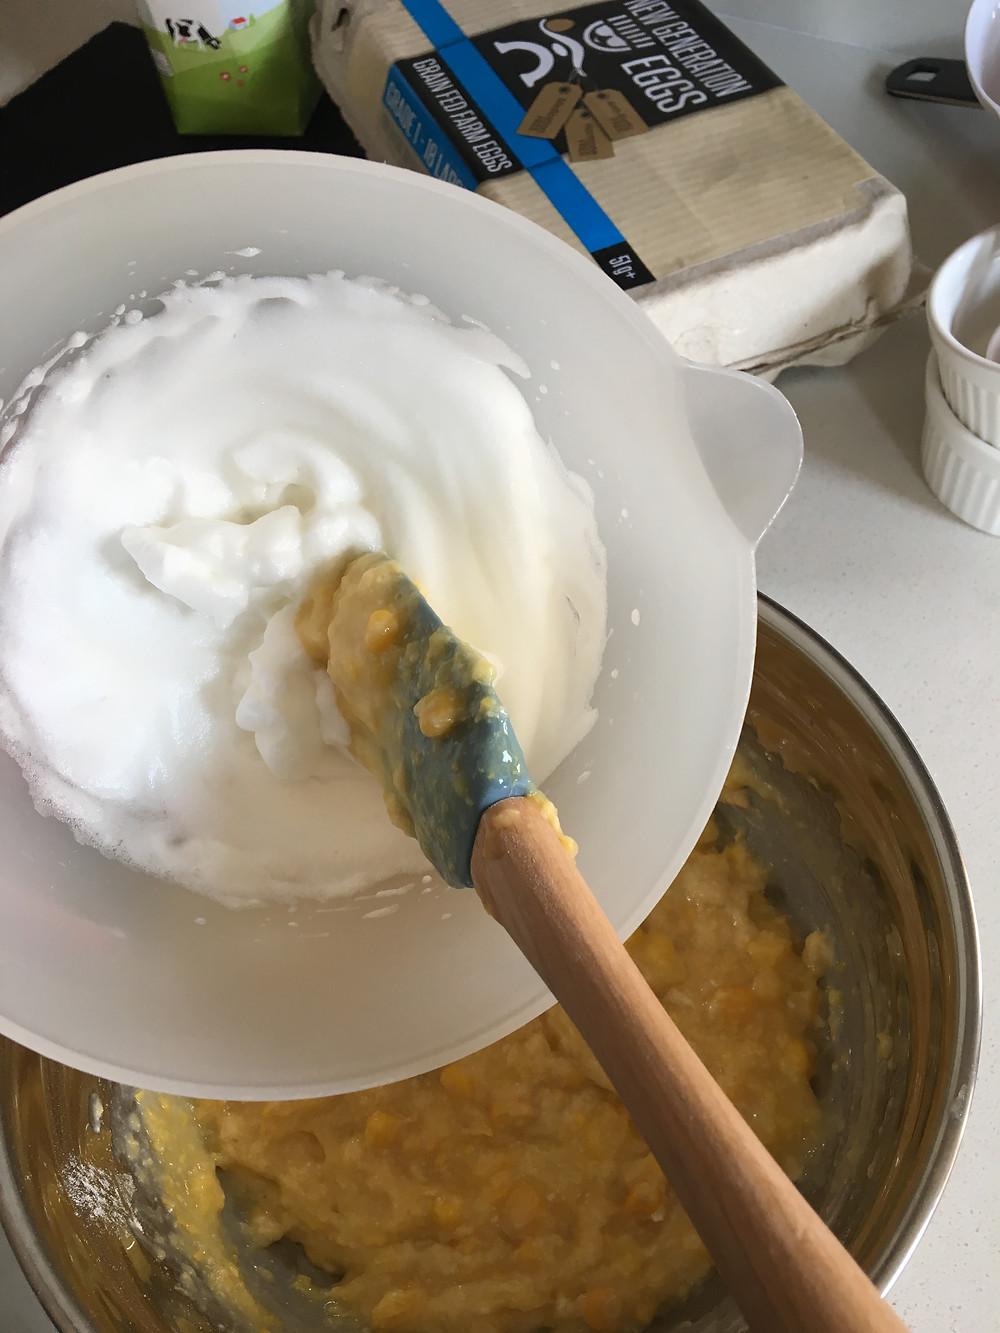 Folding the egg whites into the sweetcorn batter